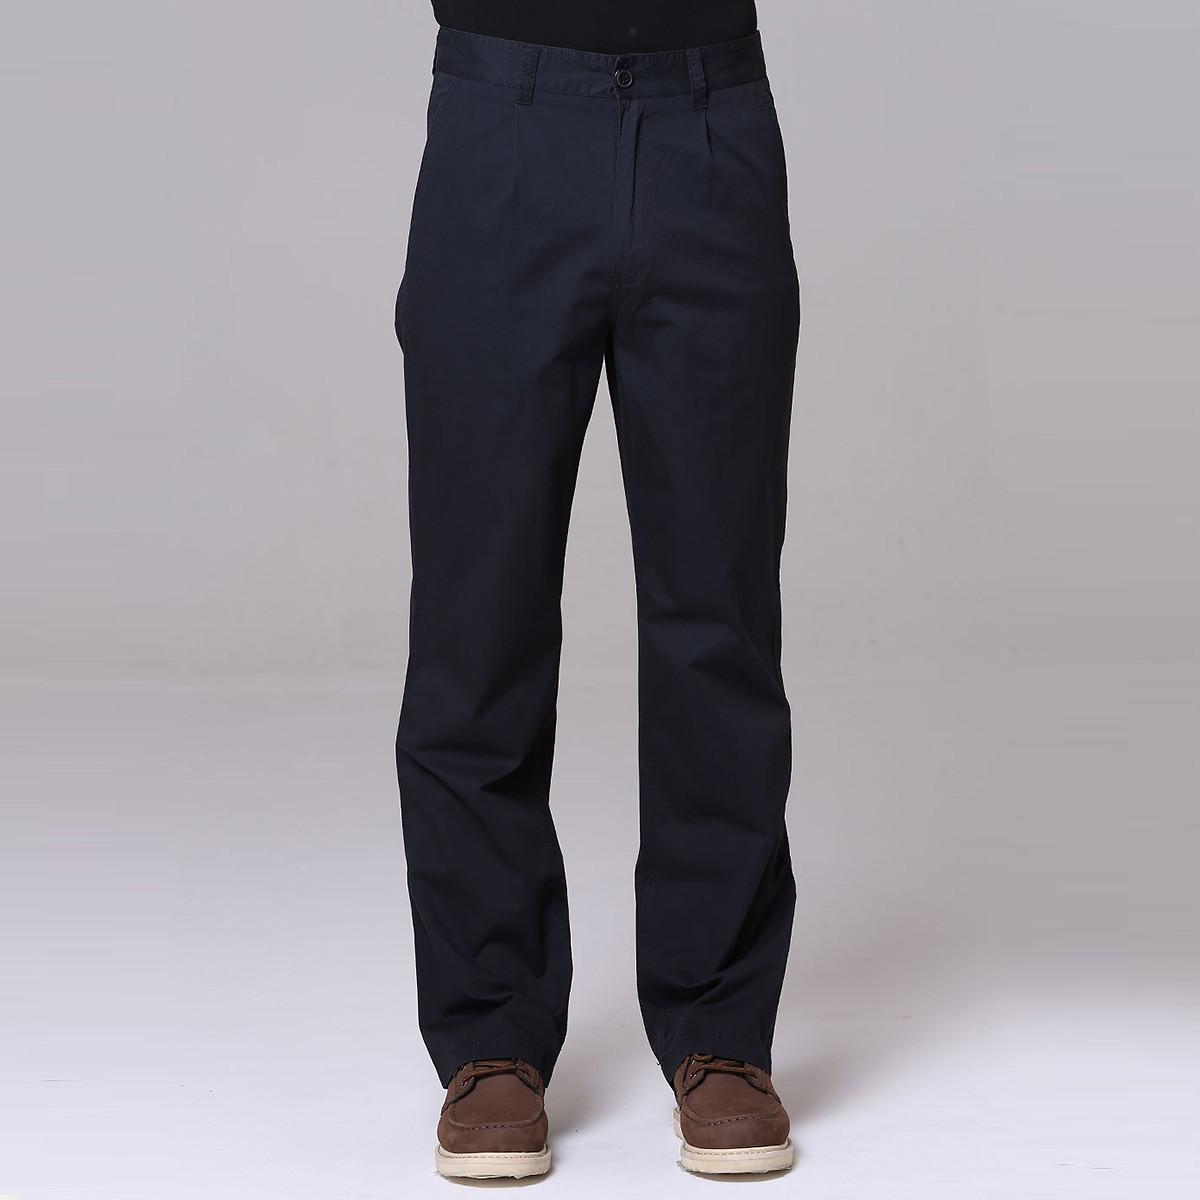 JEEPJEEP休闲透气全棉舒适无摺基本款男款休闲裤JS12WP102K9